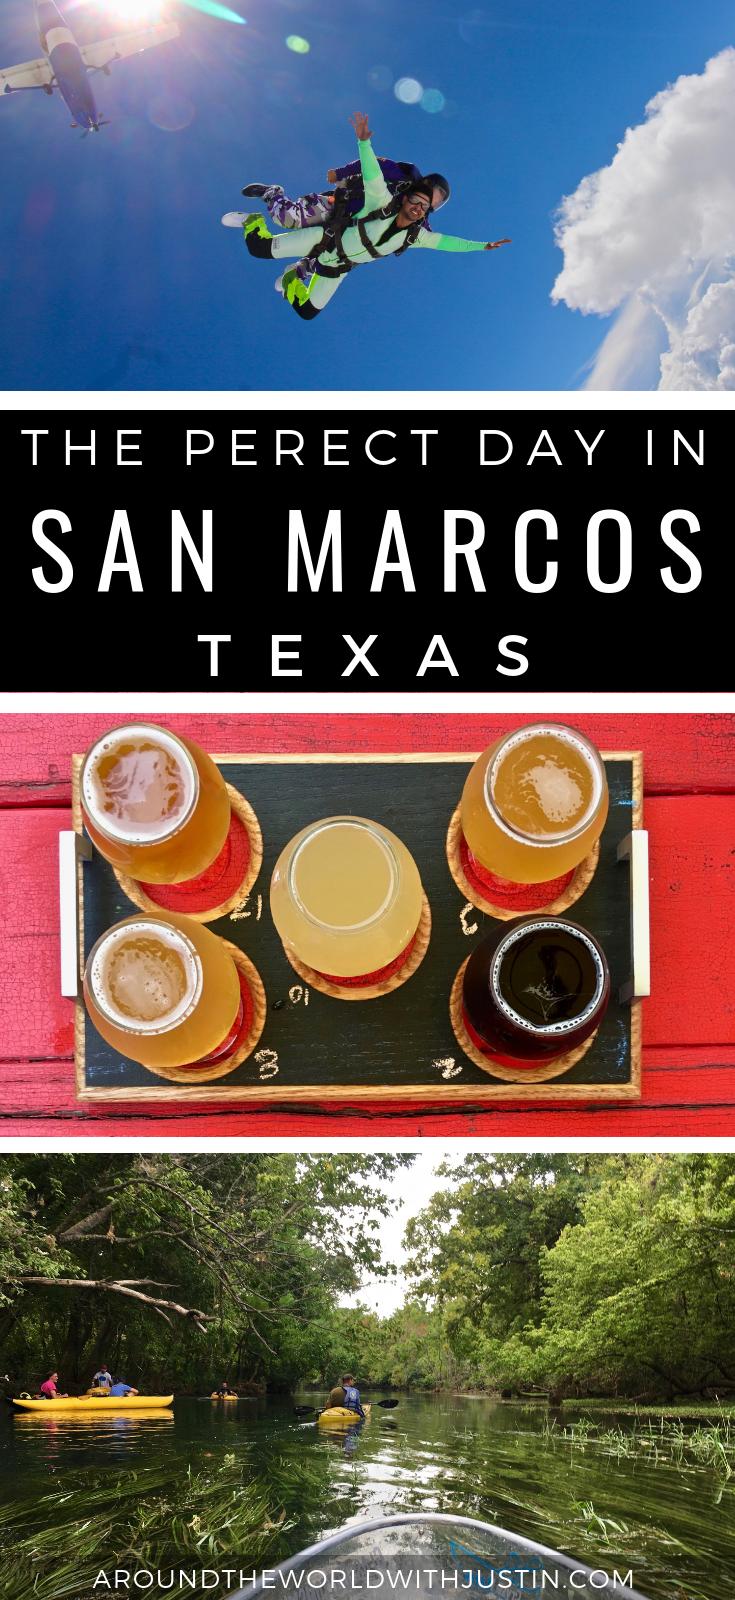 San Marcos Texas